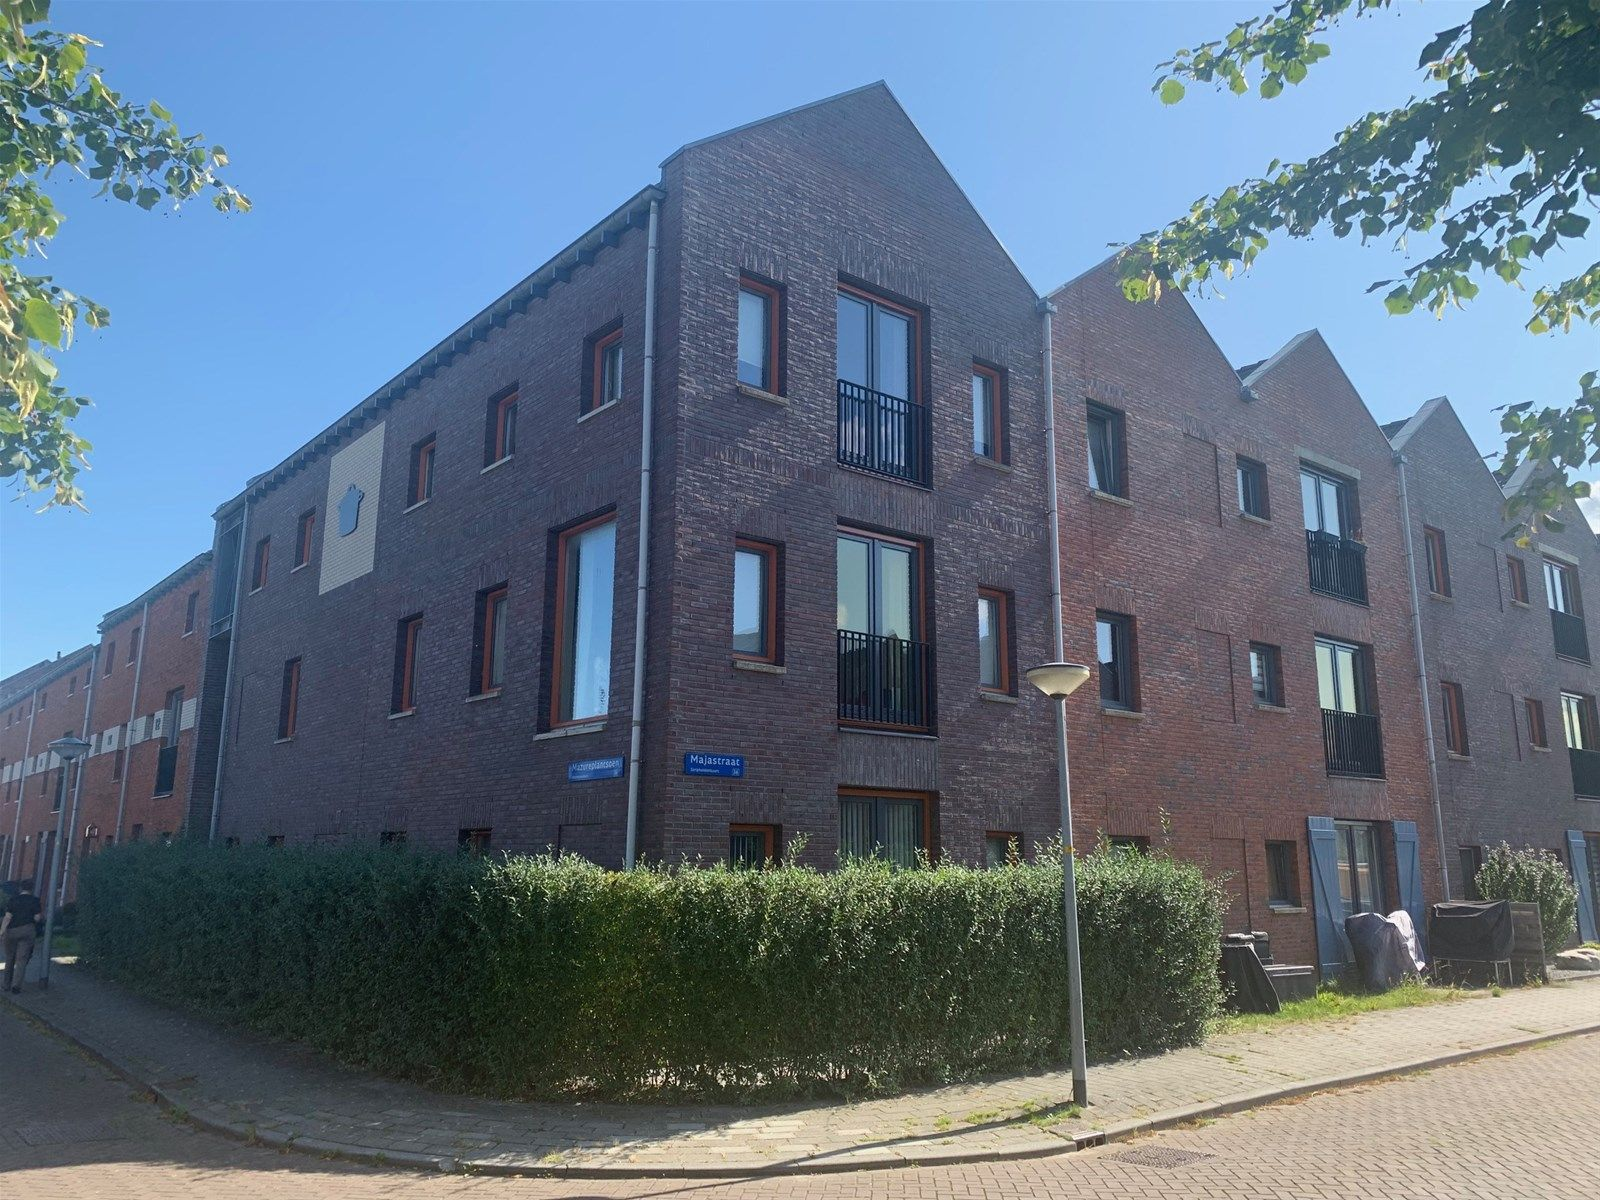 Dick Bosstraat 91, Almere